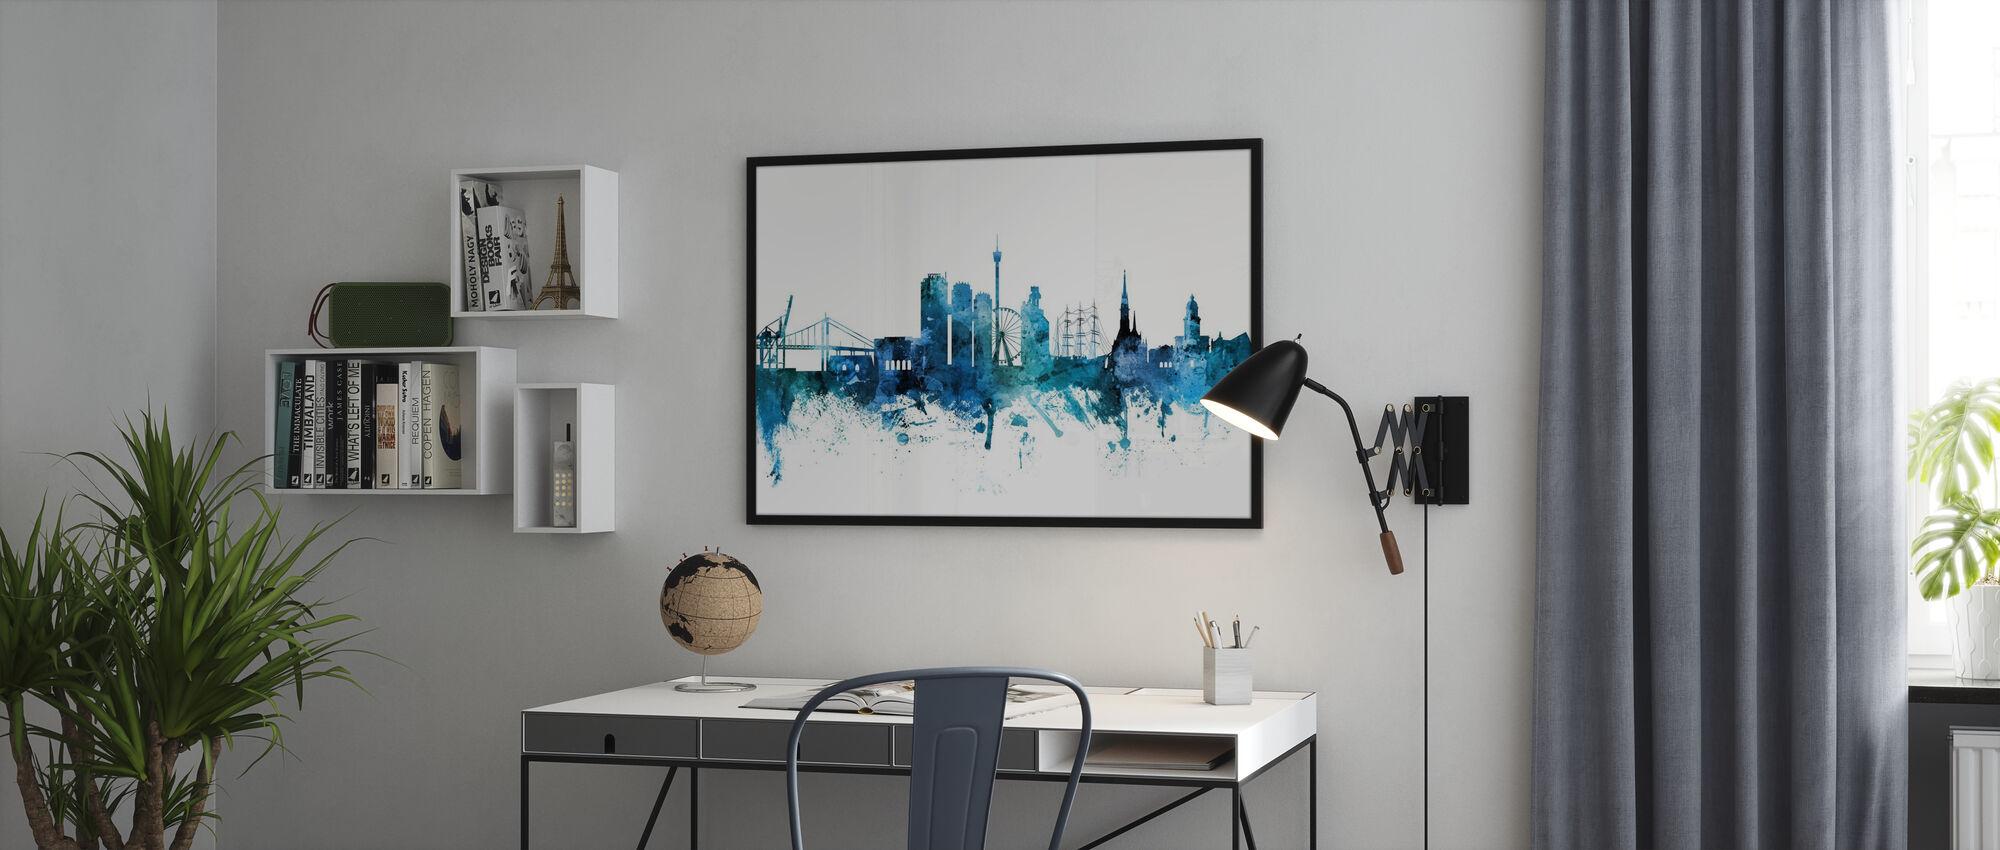 Göteborgs Skyline - Poster - Kontor